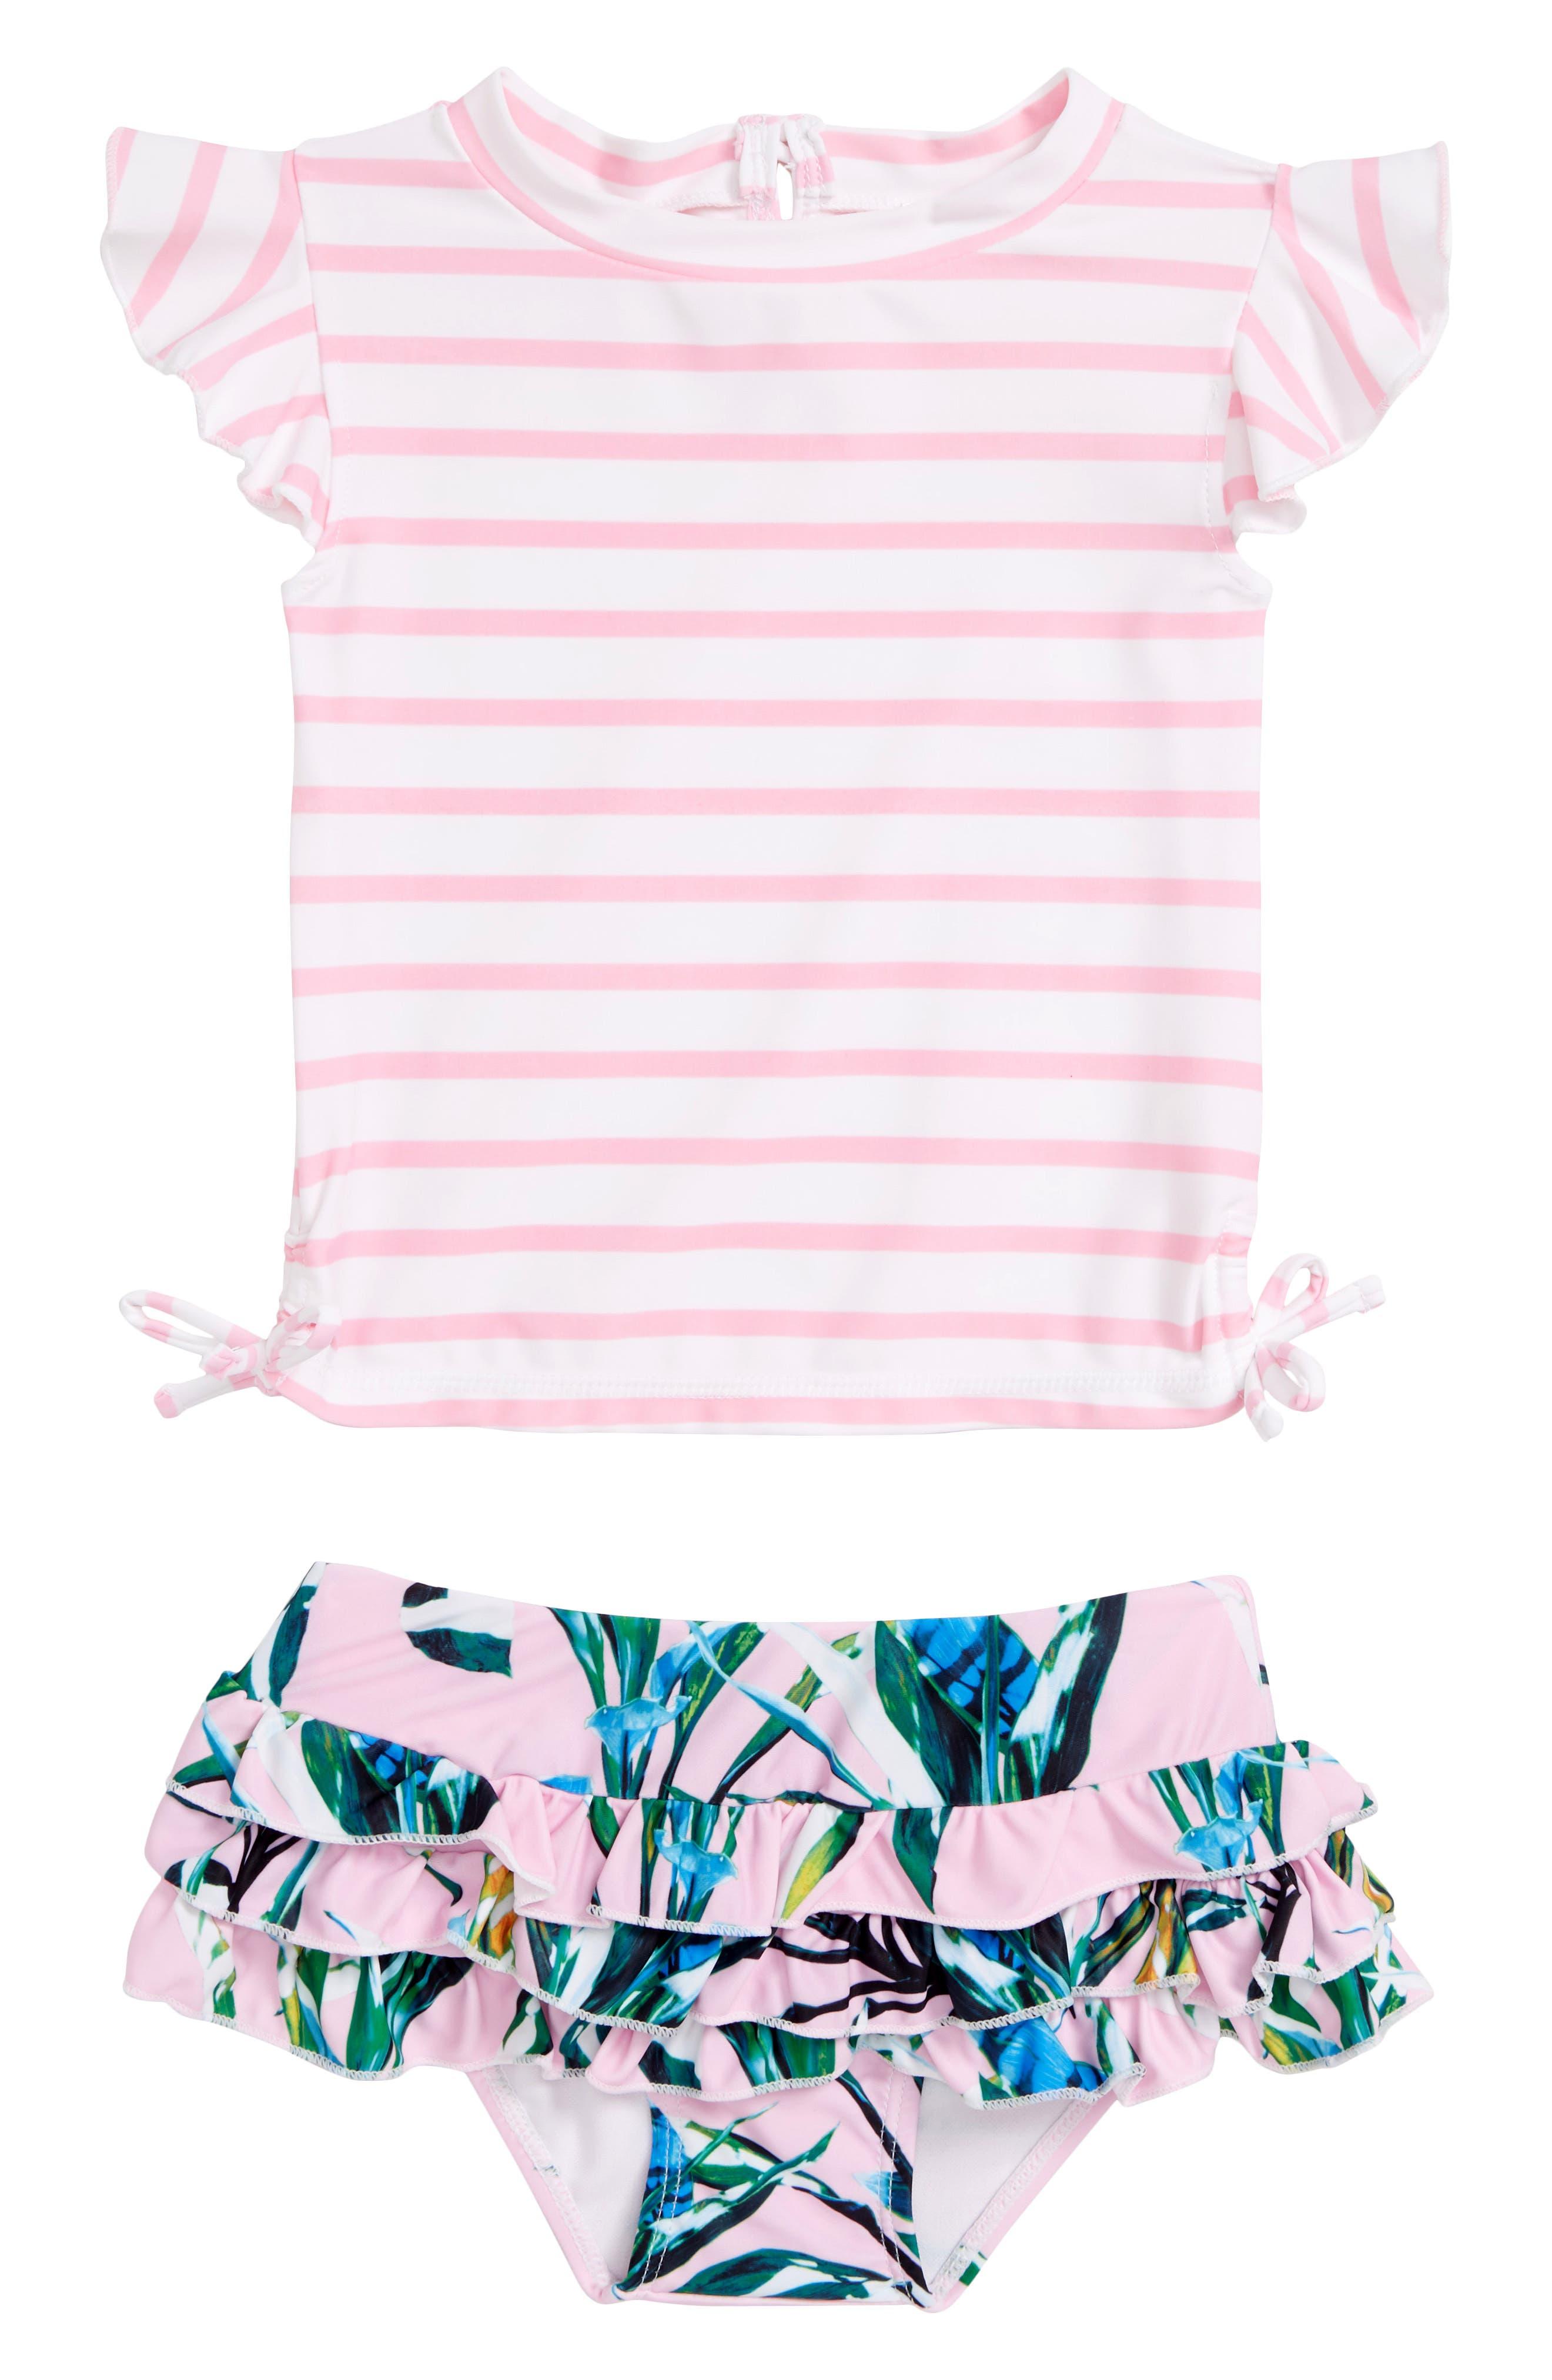 Royale Palm Two-Piece Rashguard Swimsuit,                             Main thumbnail 1, color,                             PINK